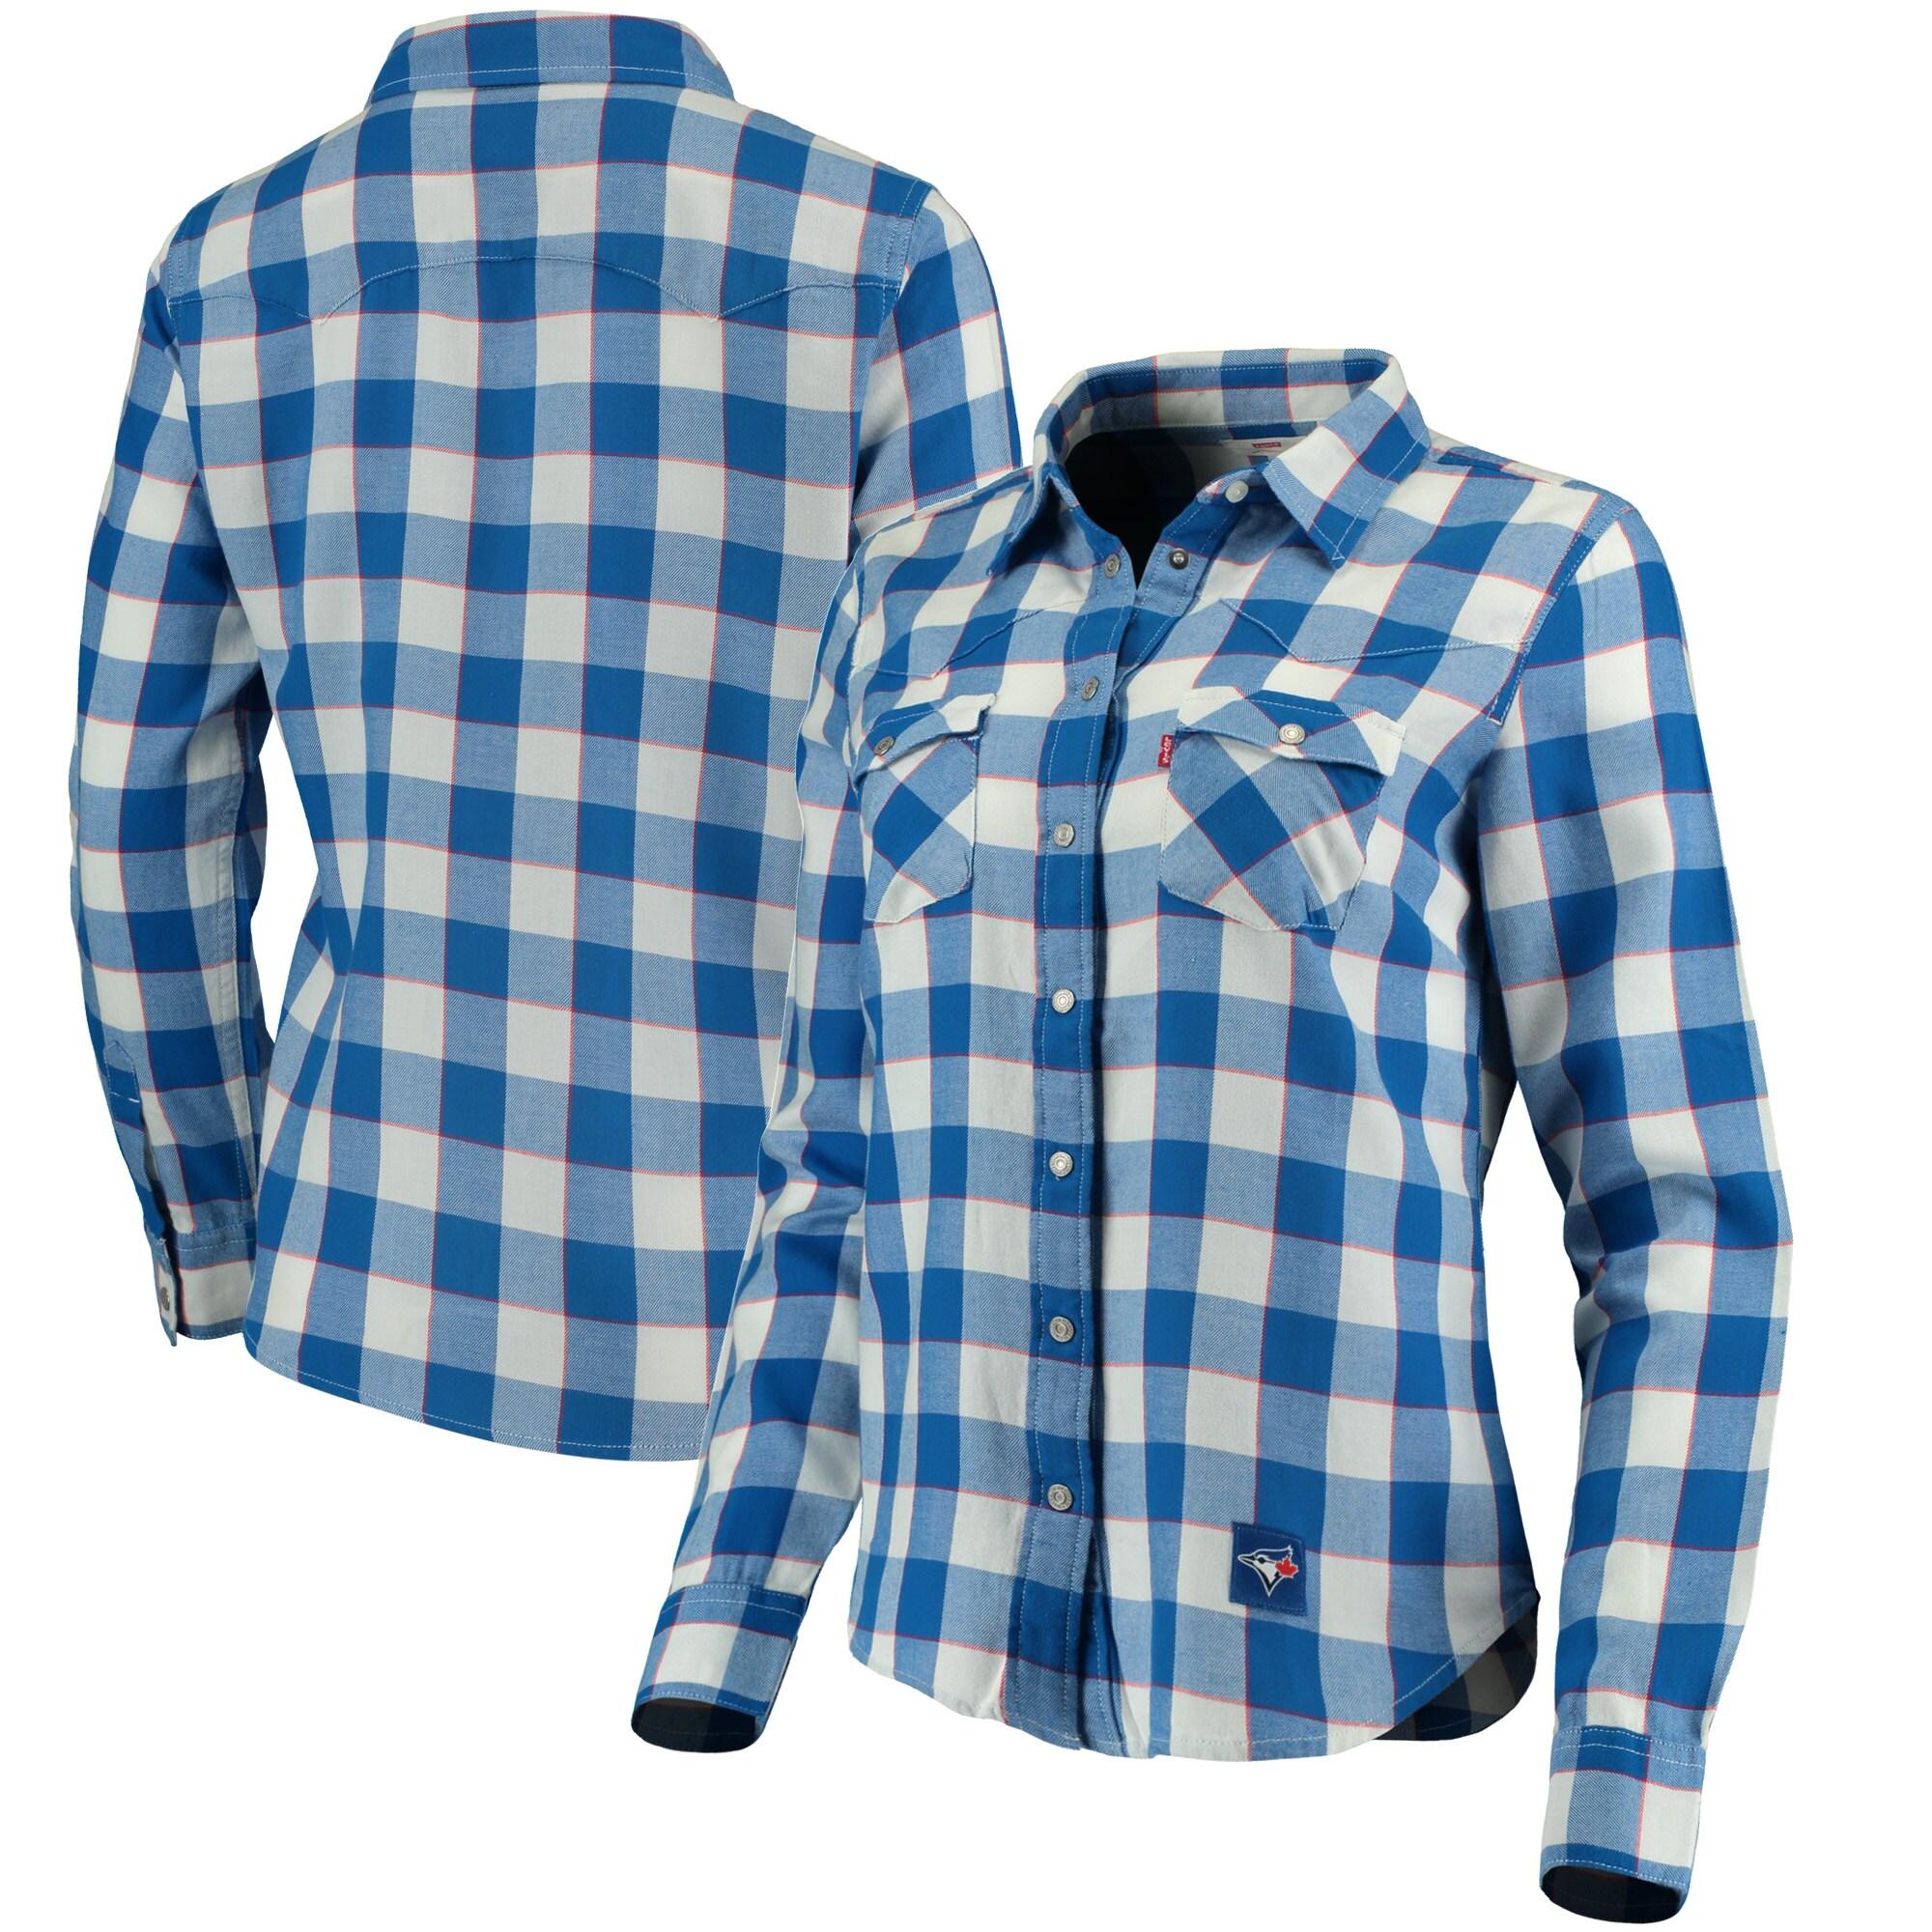 Toronto Blue Jays Levi's Women's Western Full-Snap Shirt - Royal